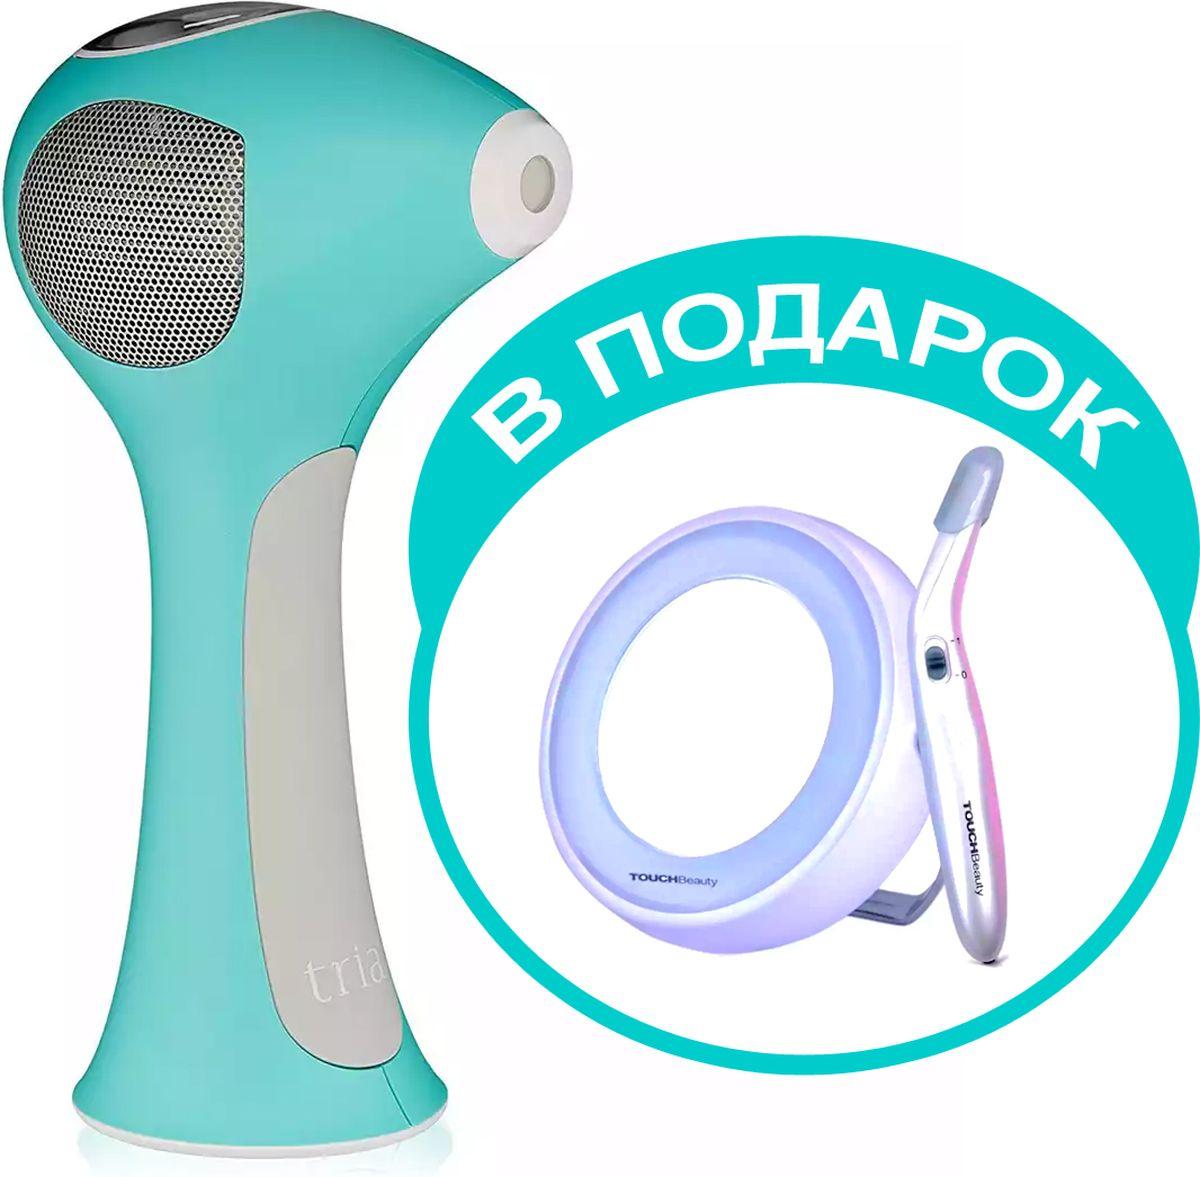 TRIA Лазерный эпилятор Hair Removal Laser4X Turquoise + ПОДАРОК! Косметический набор TOUCHBEAUTY AS-1001 - Эпиляторы